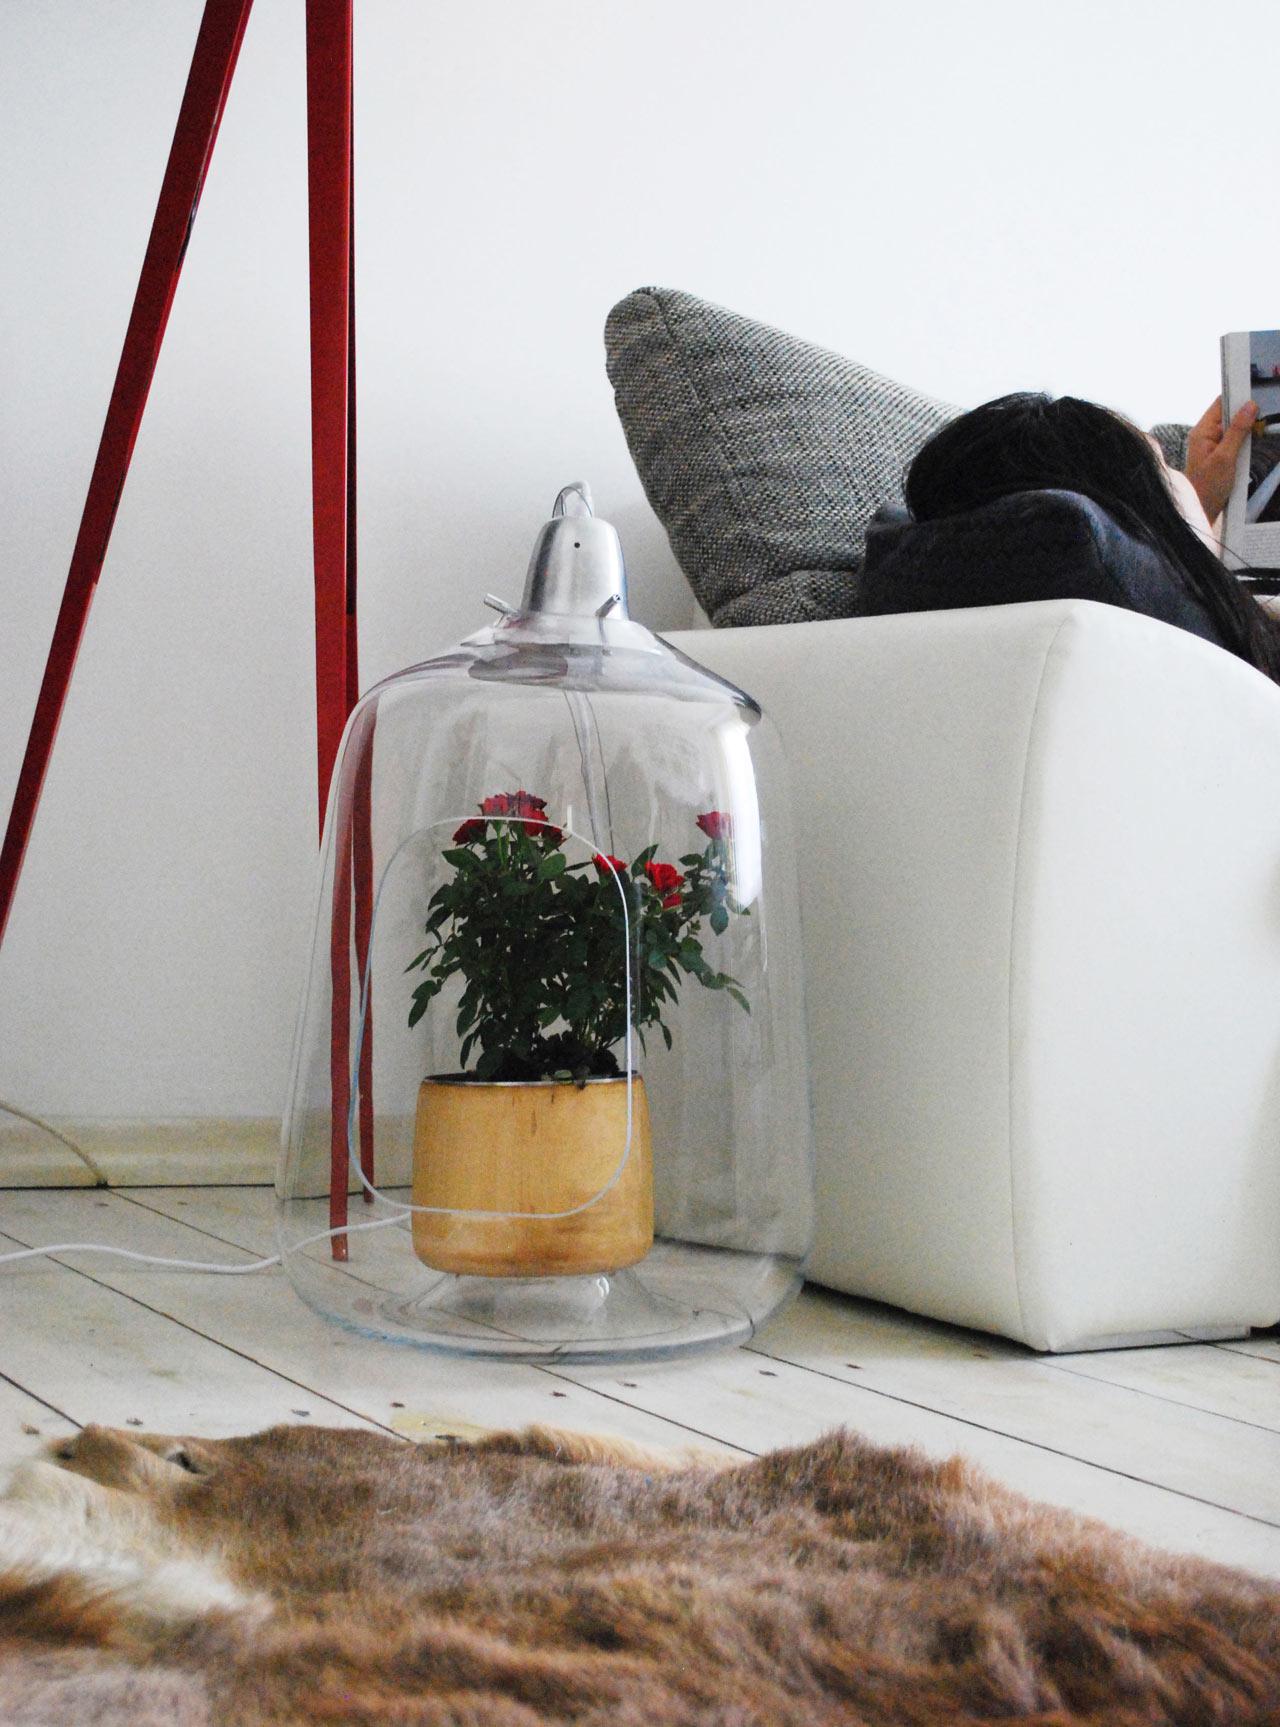 milo-led-lamp-planter-2